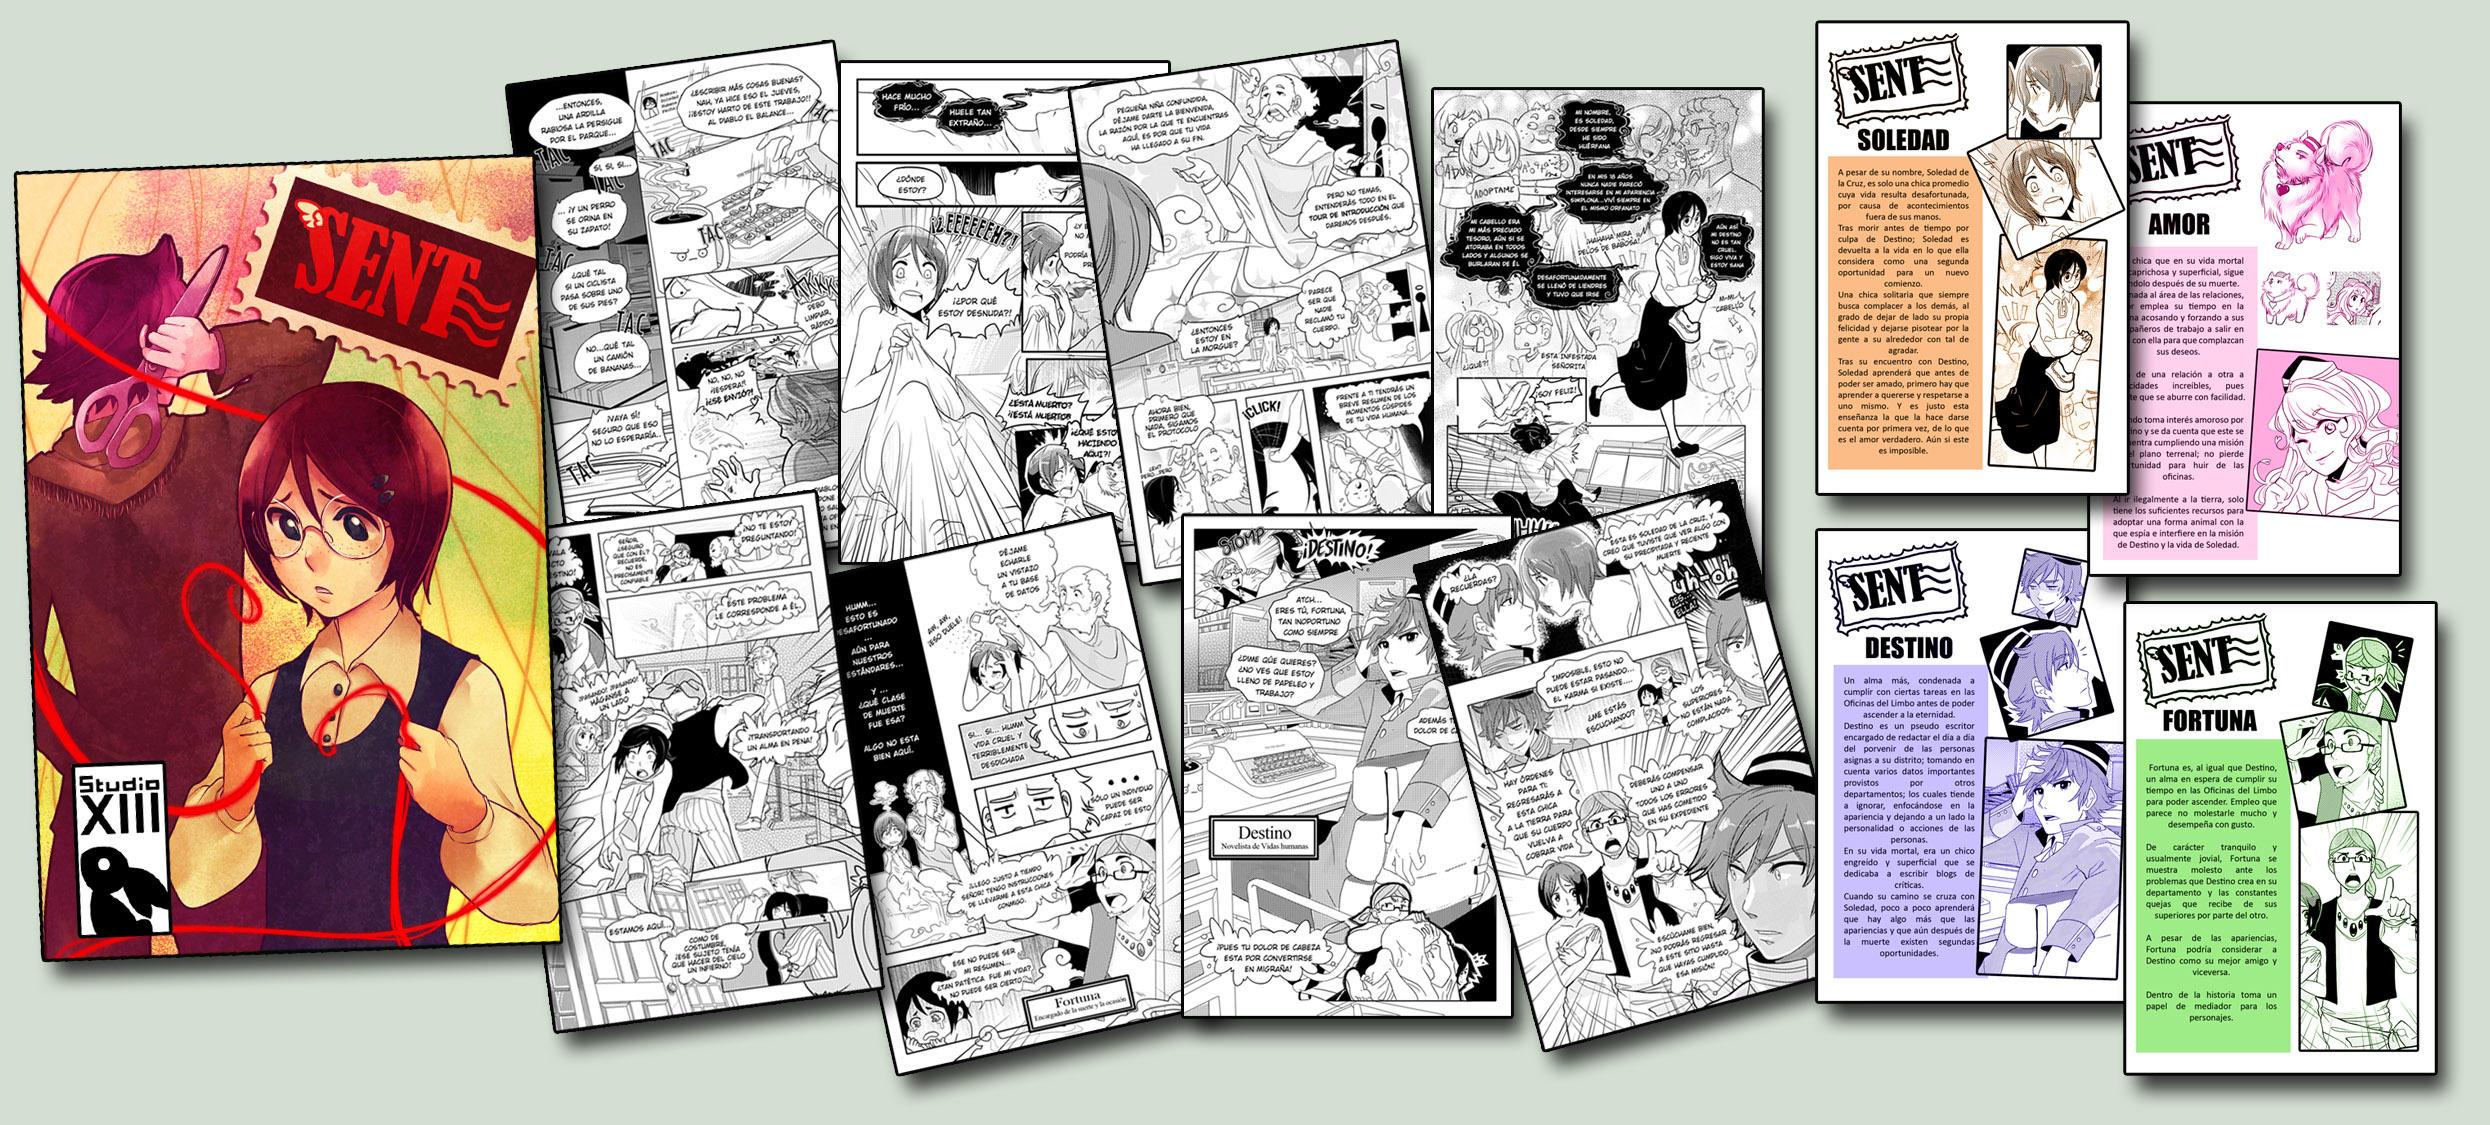 SENT -propuesta de manga NORMA by akimaro